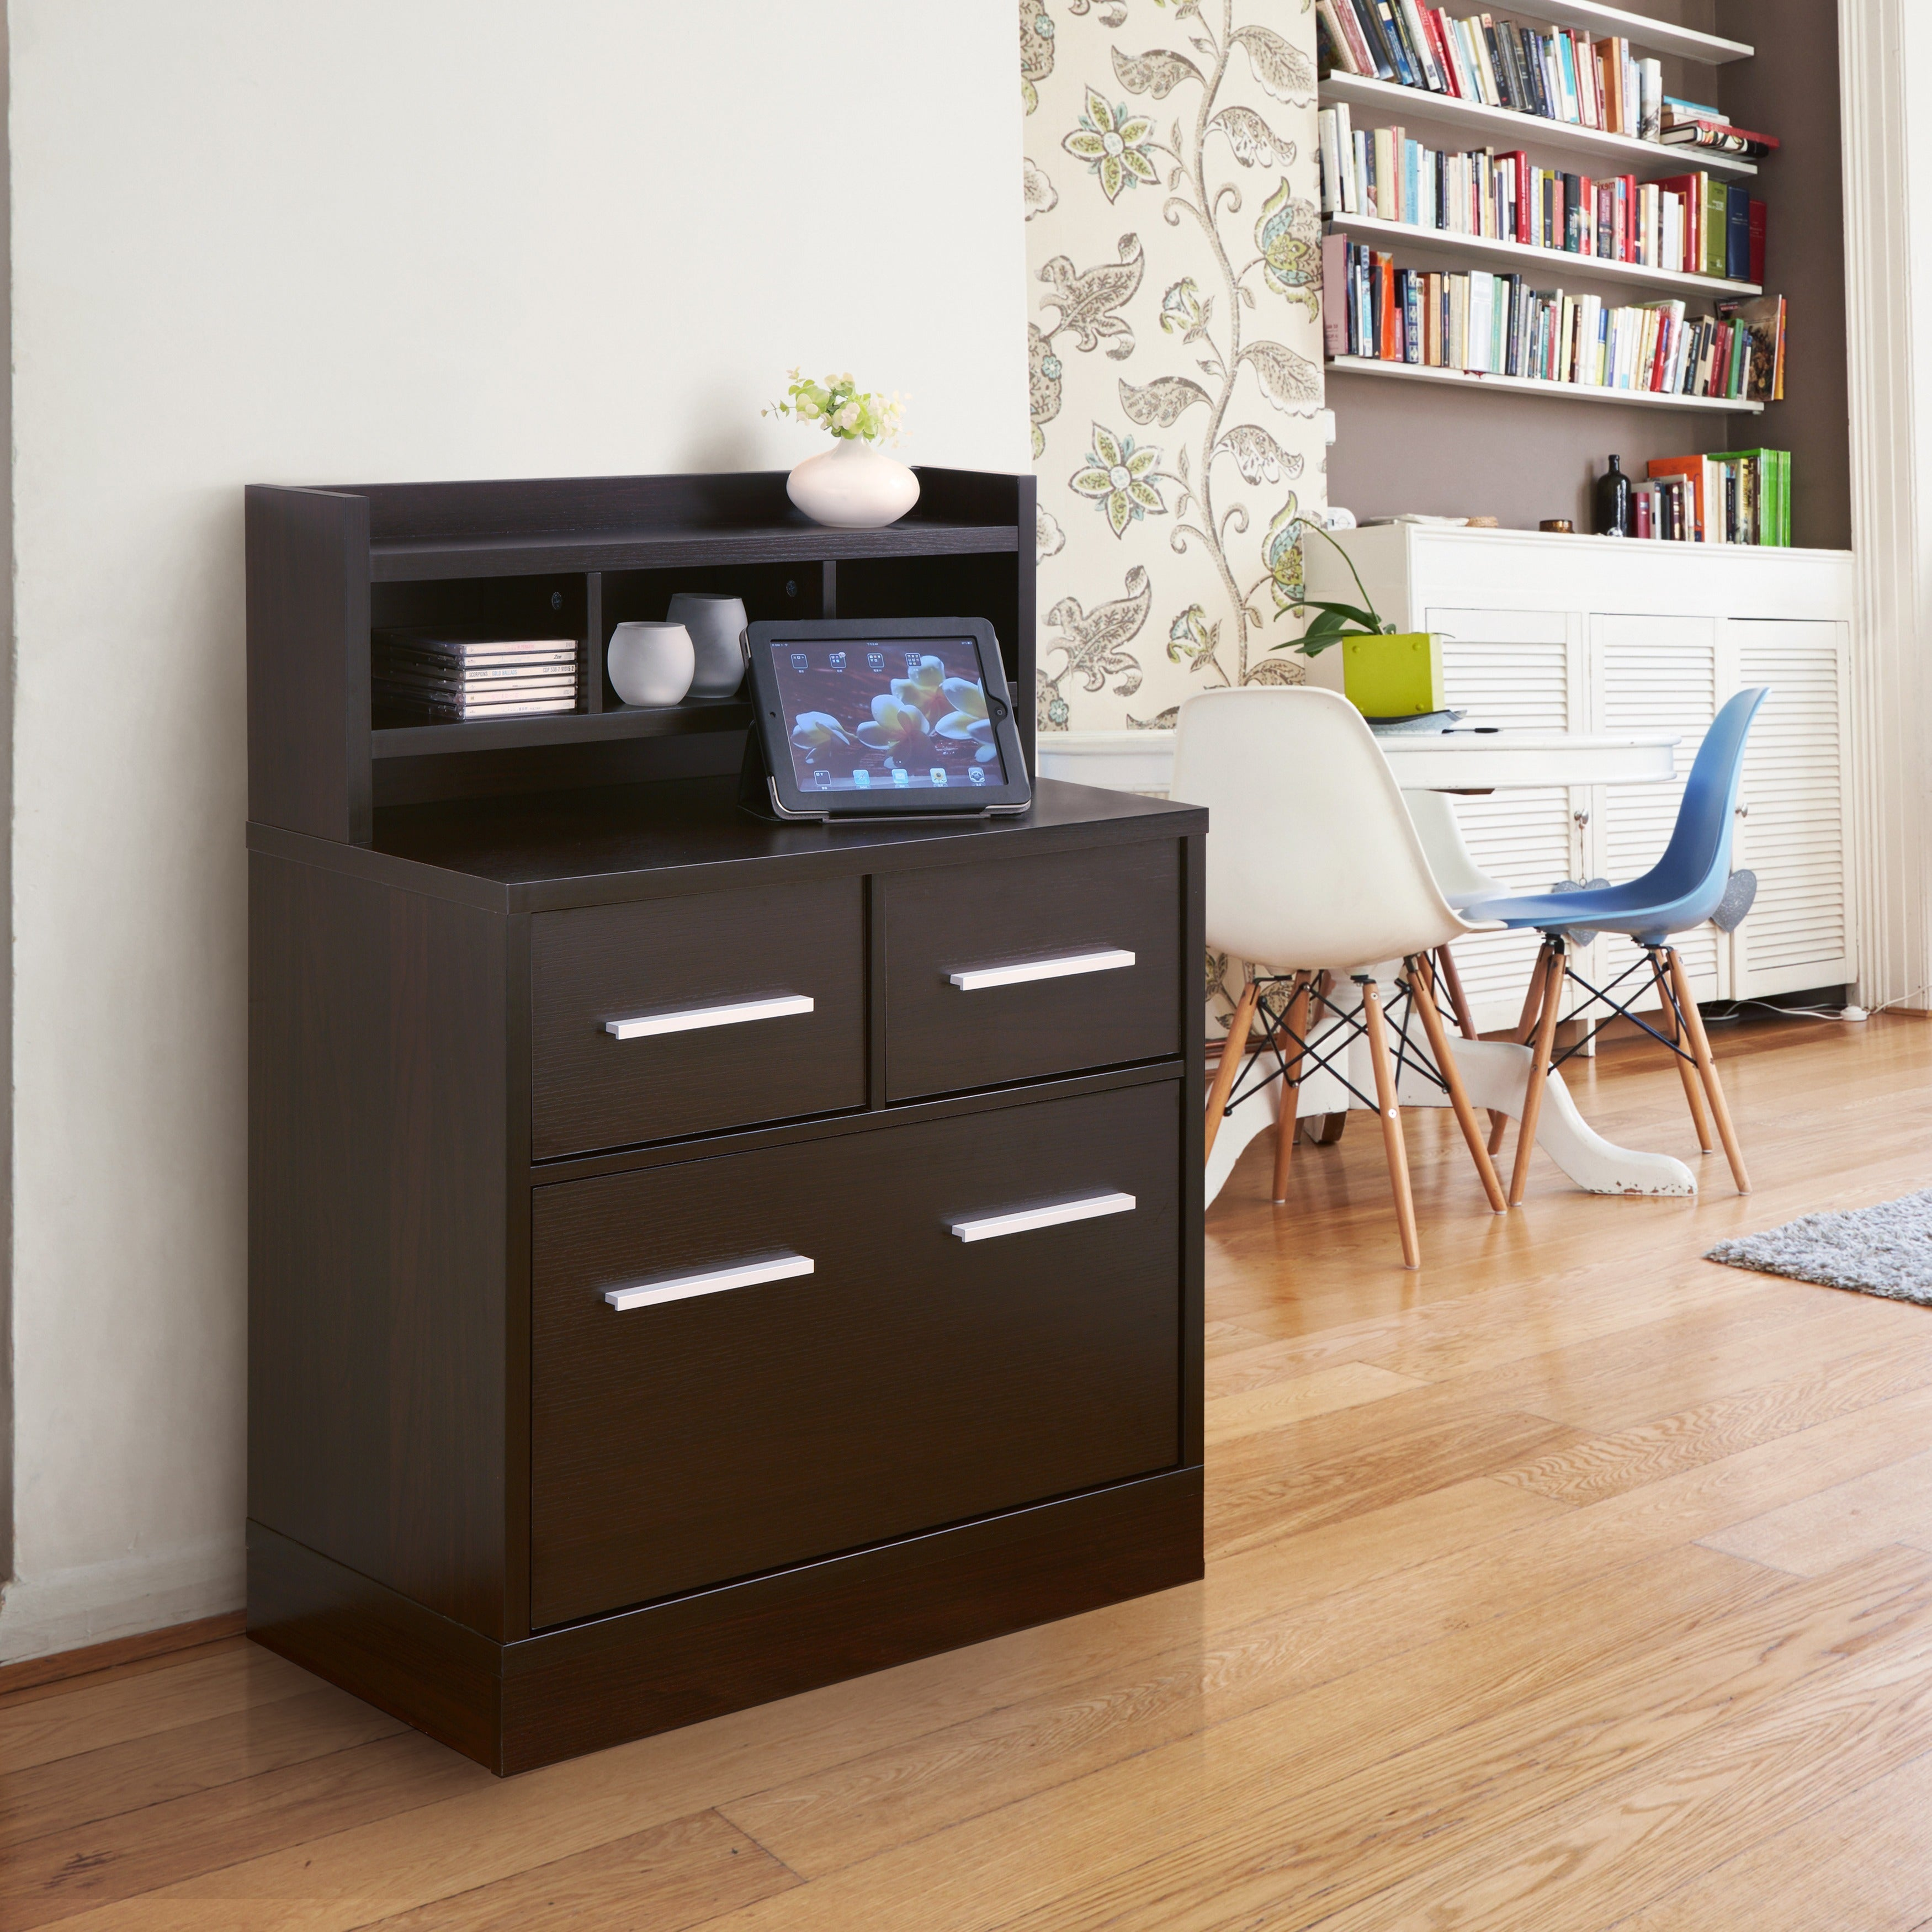 saratoga furniture harvest and bush filing executive cherry walmart with desk com ip cabinet black in